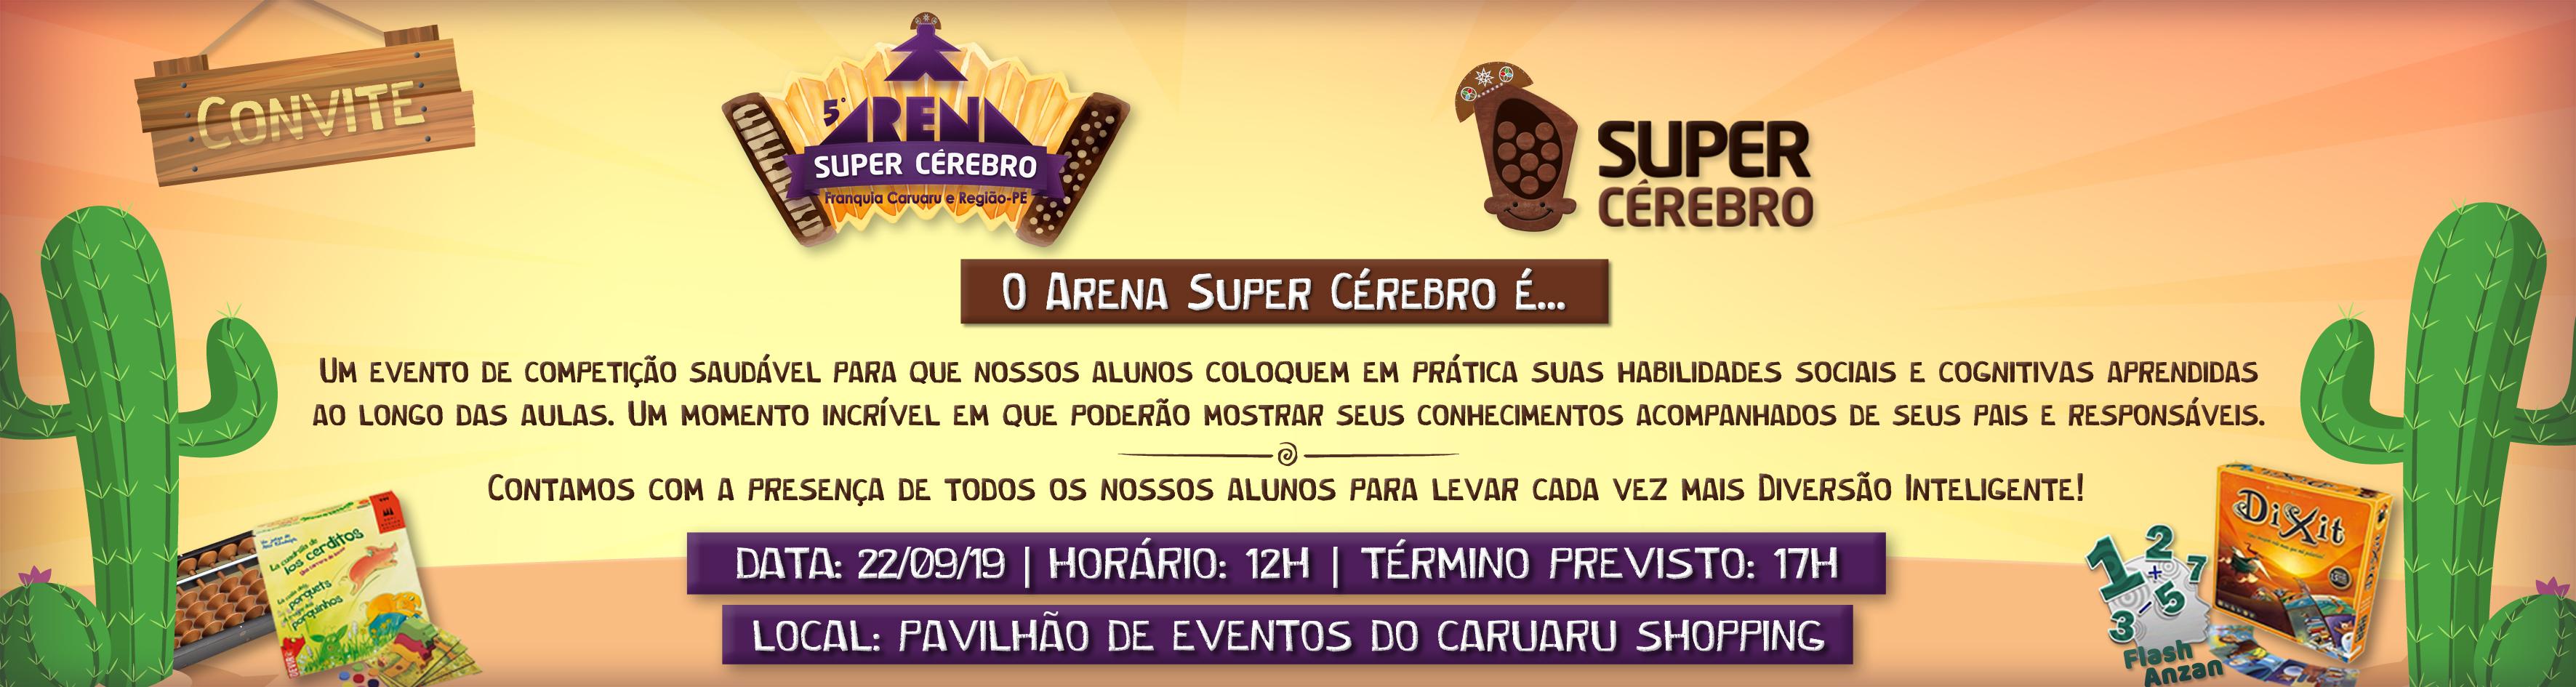 Arena SuperCérebro